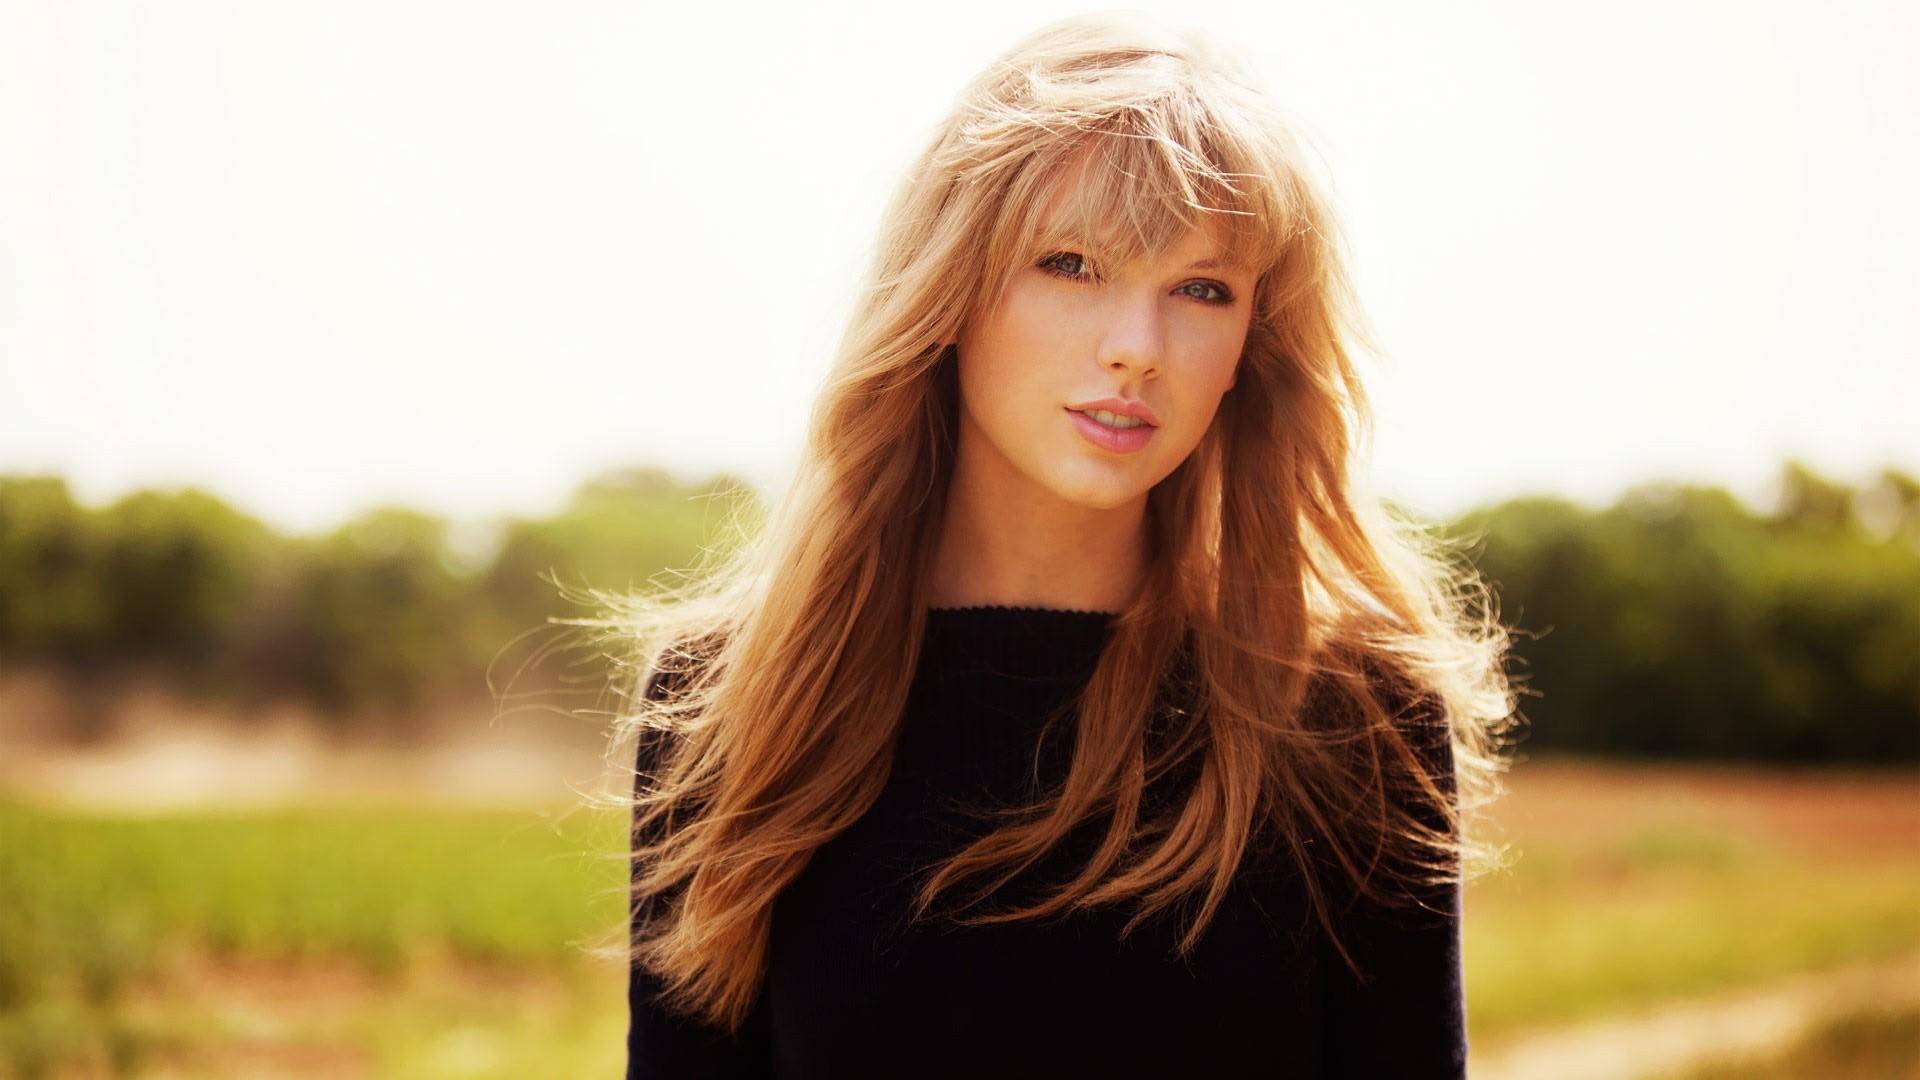 Taylor Swift Full HD Wallpaper